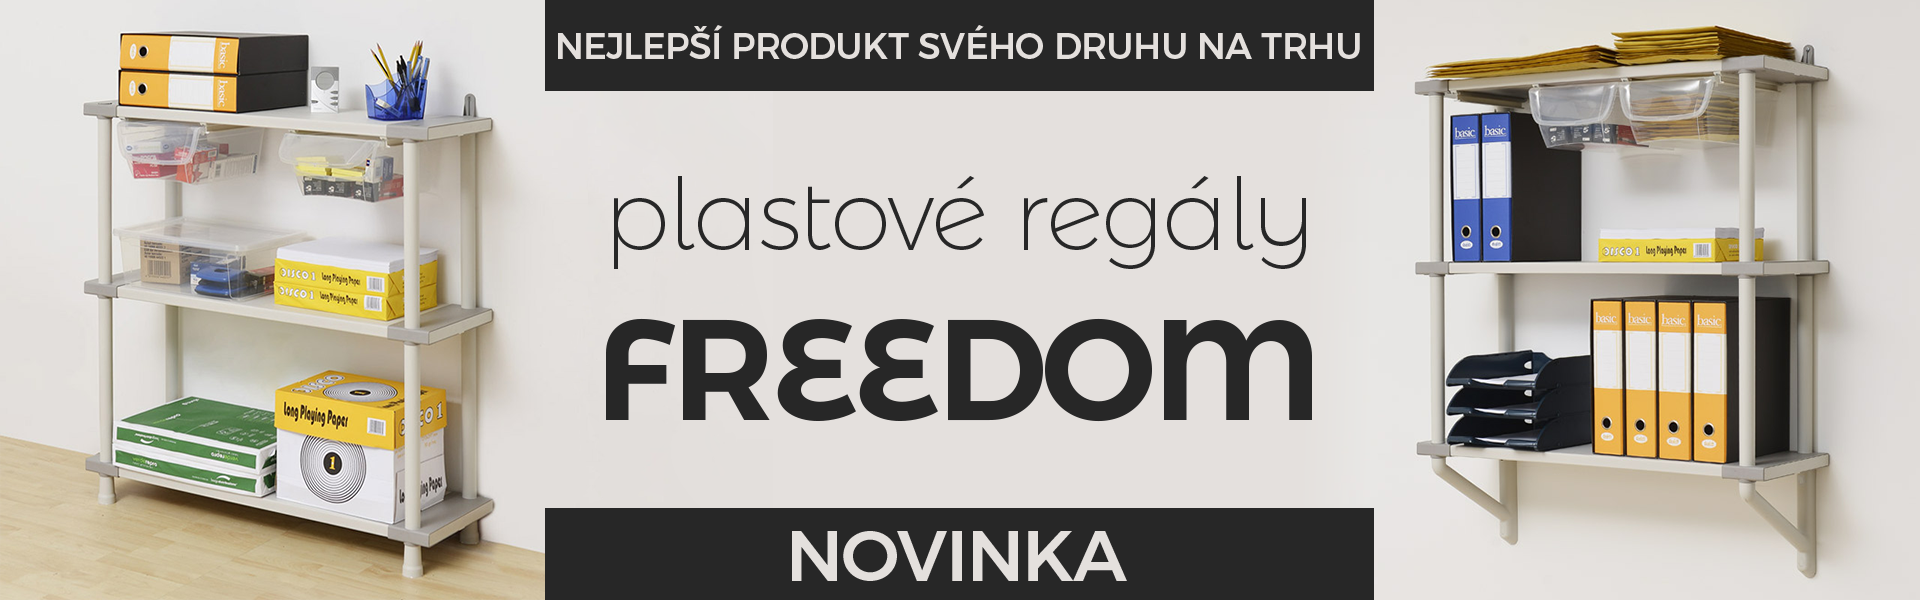 Plastové regály Freedom